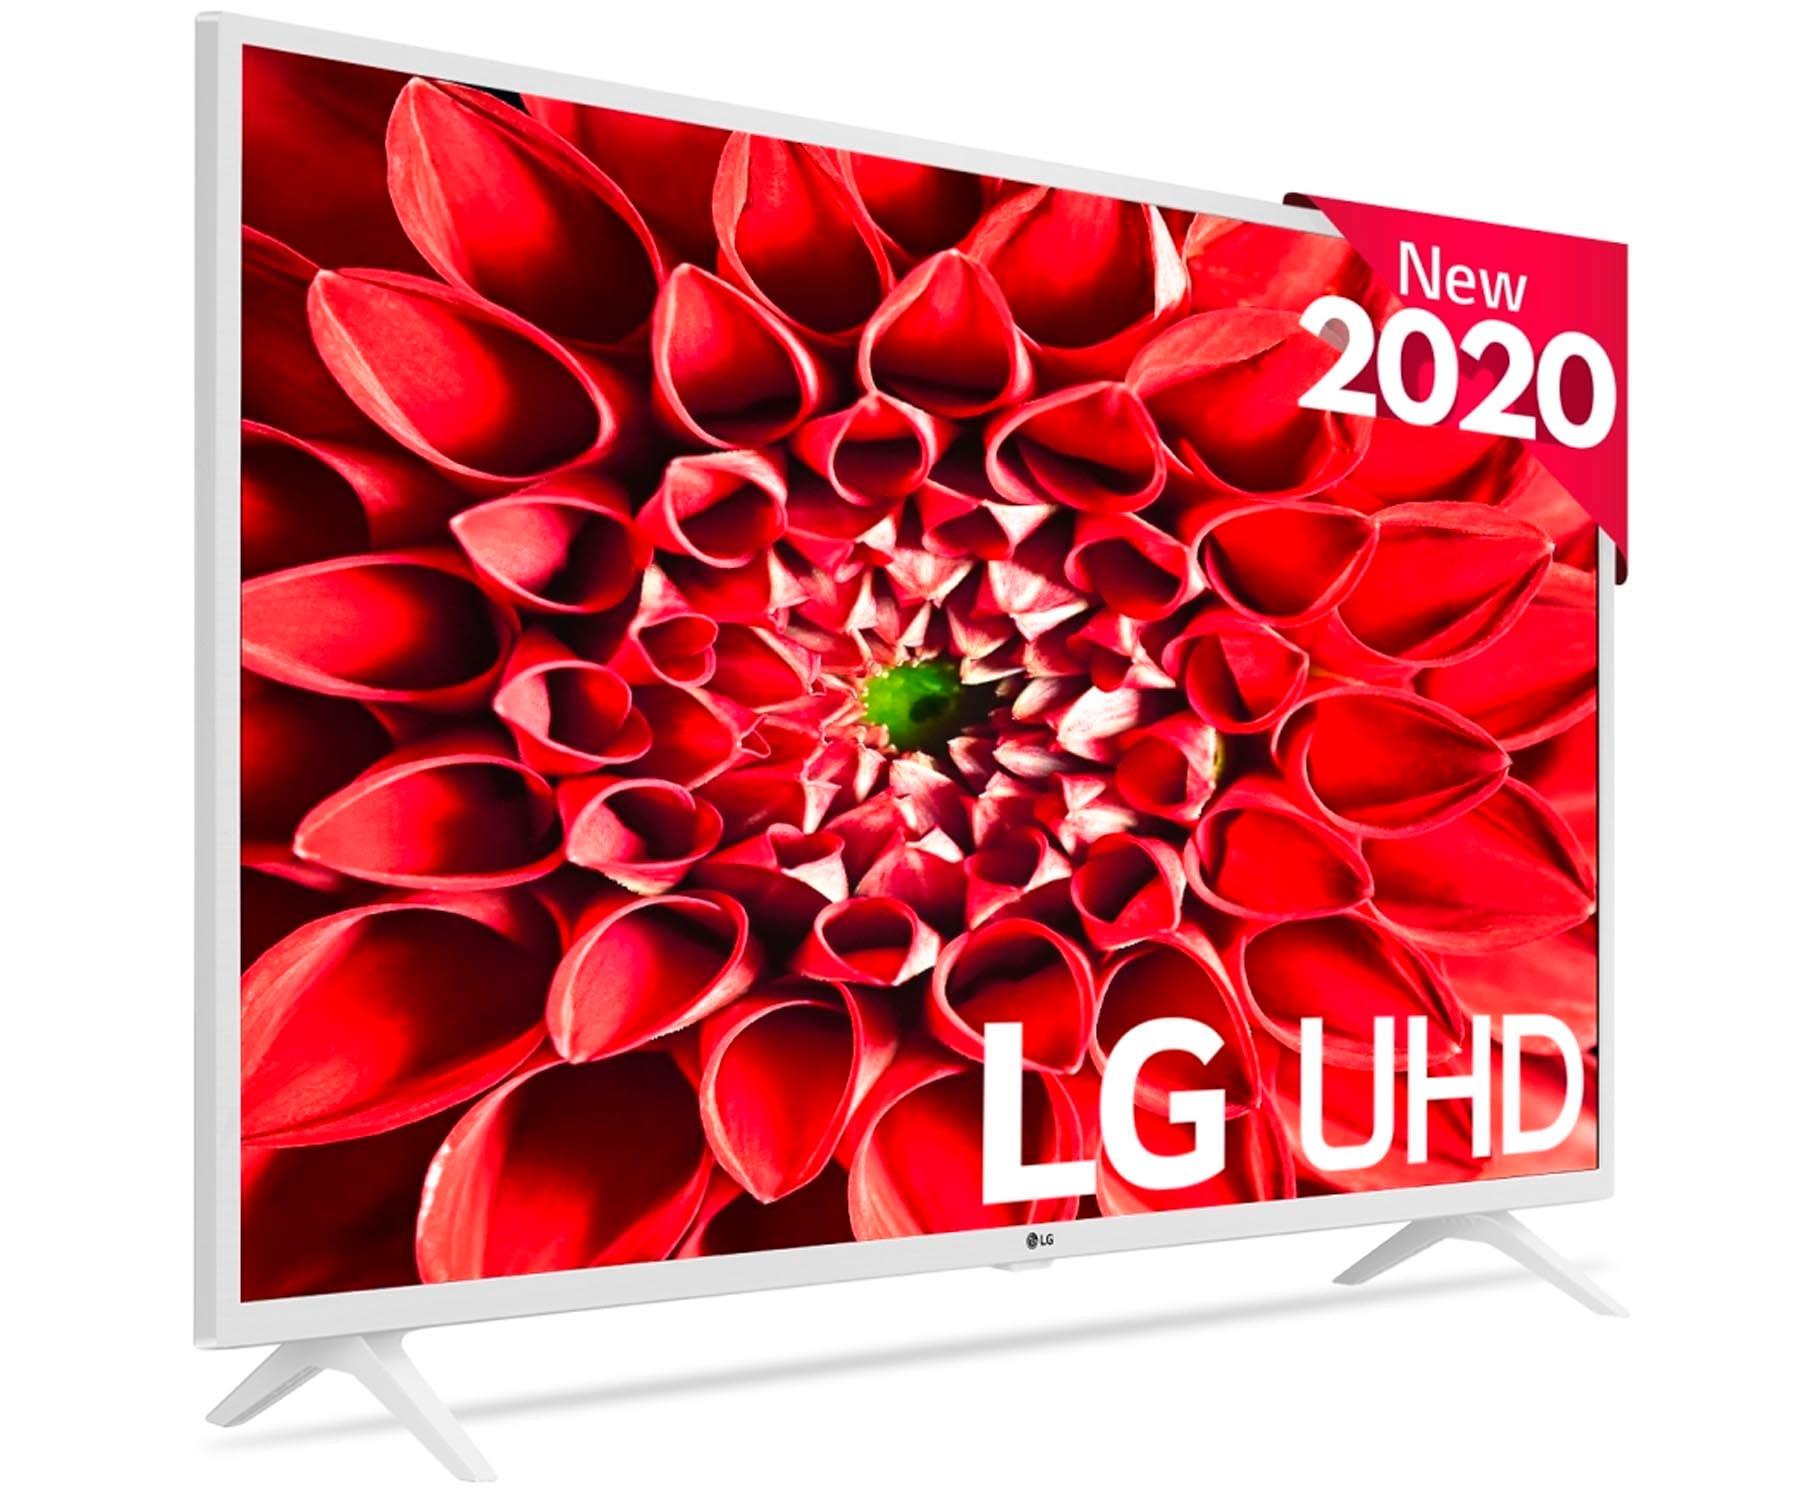 LG 49UN73906LE BLANCO TELEVISOR 49'' LCD LED 4K HDR SMART TV WEBOS 5.0 WIFI BLUETOOTH HDMI USB